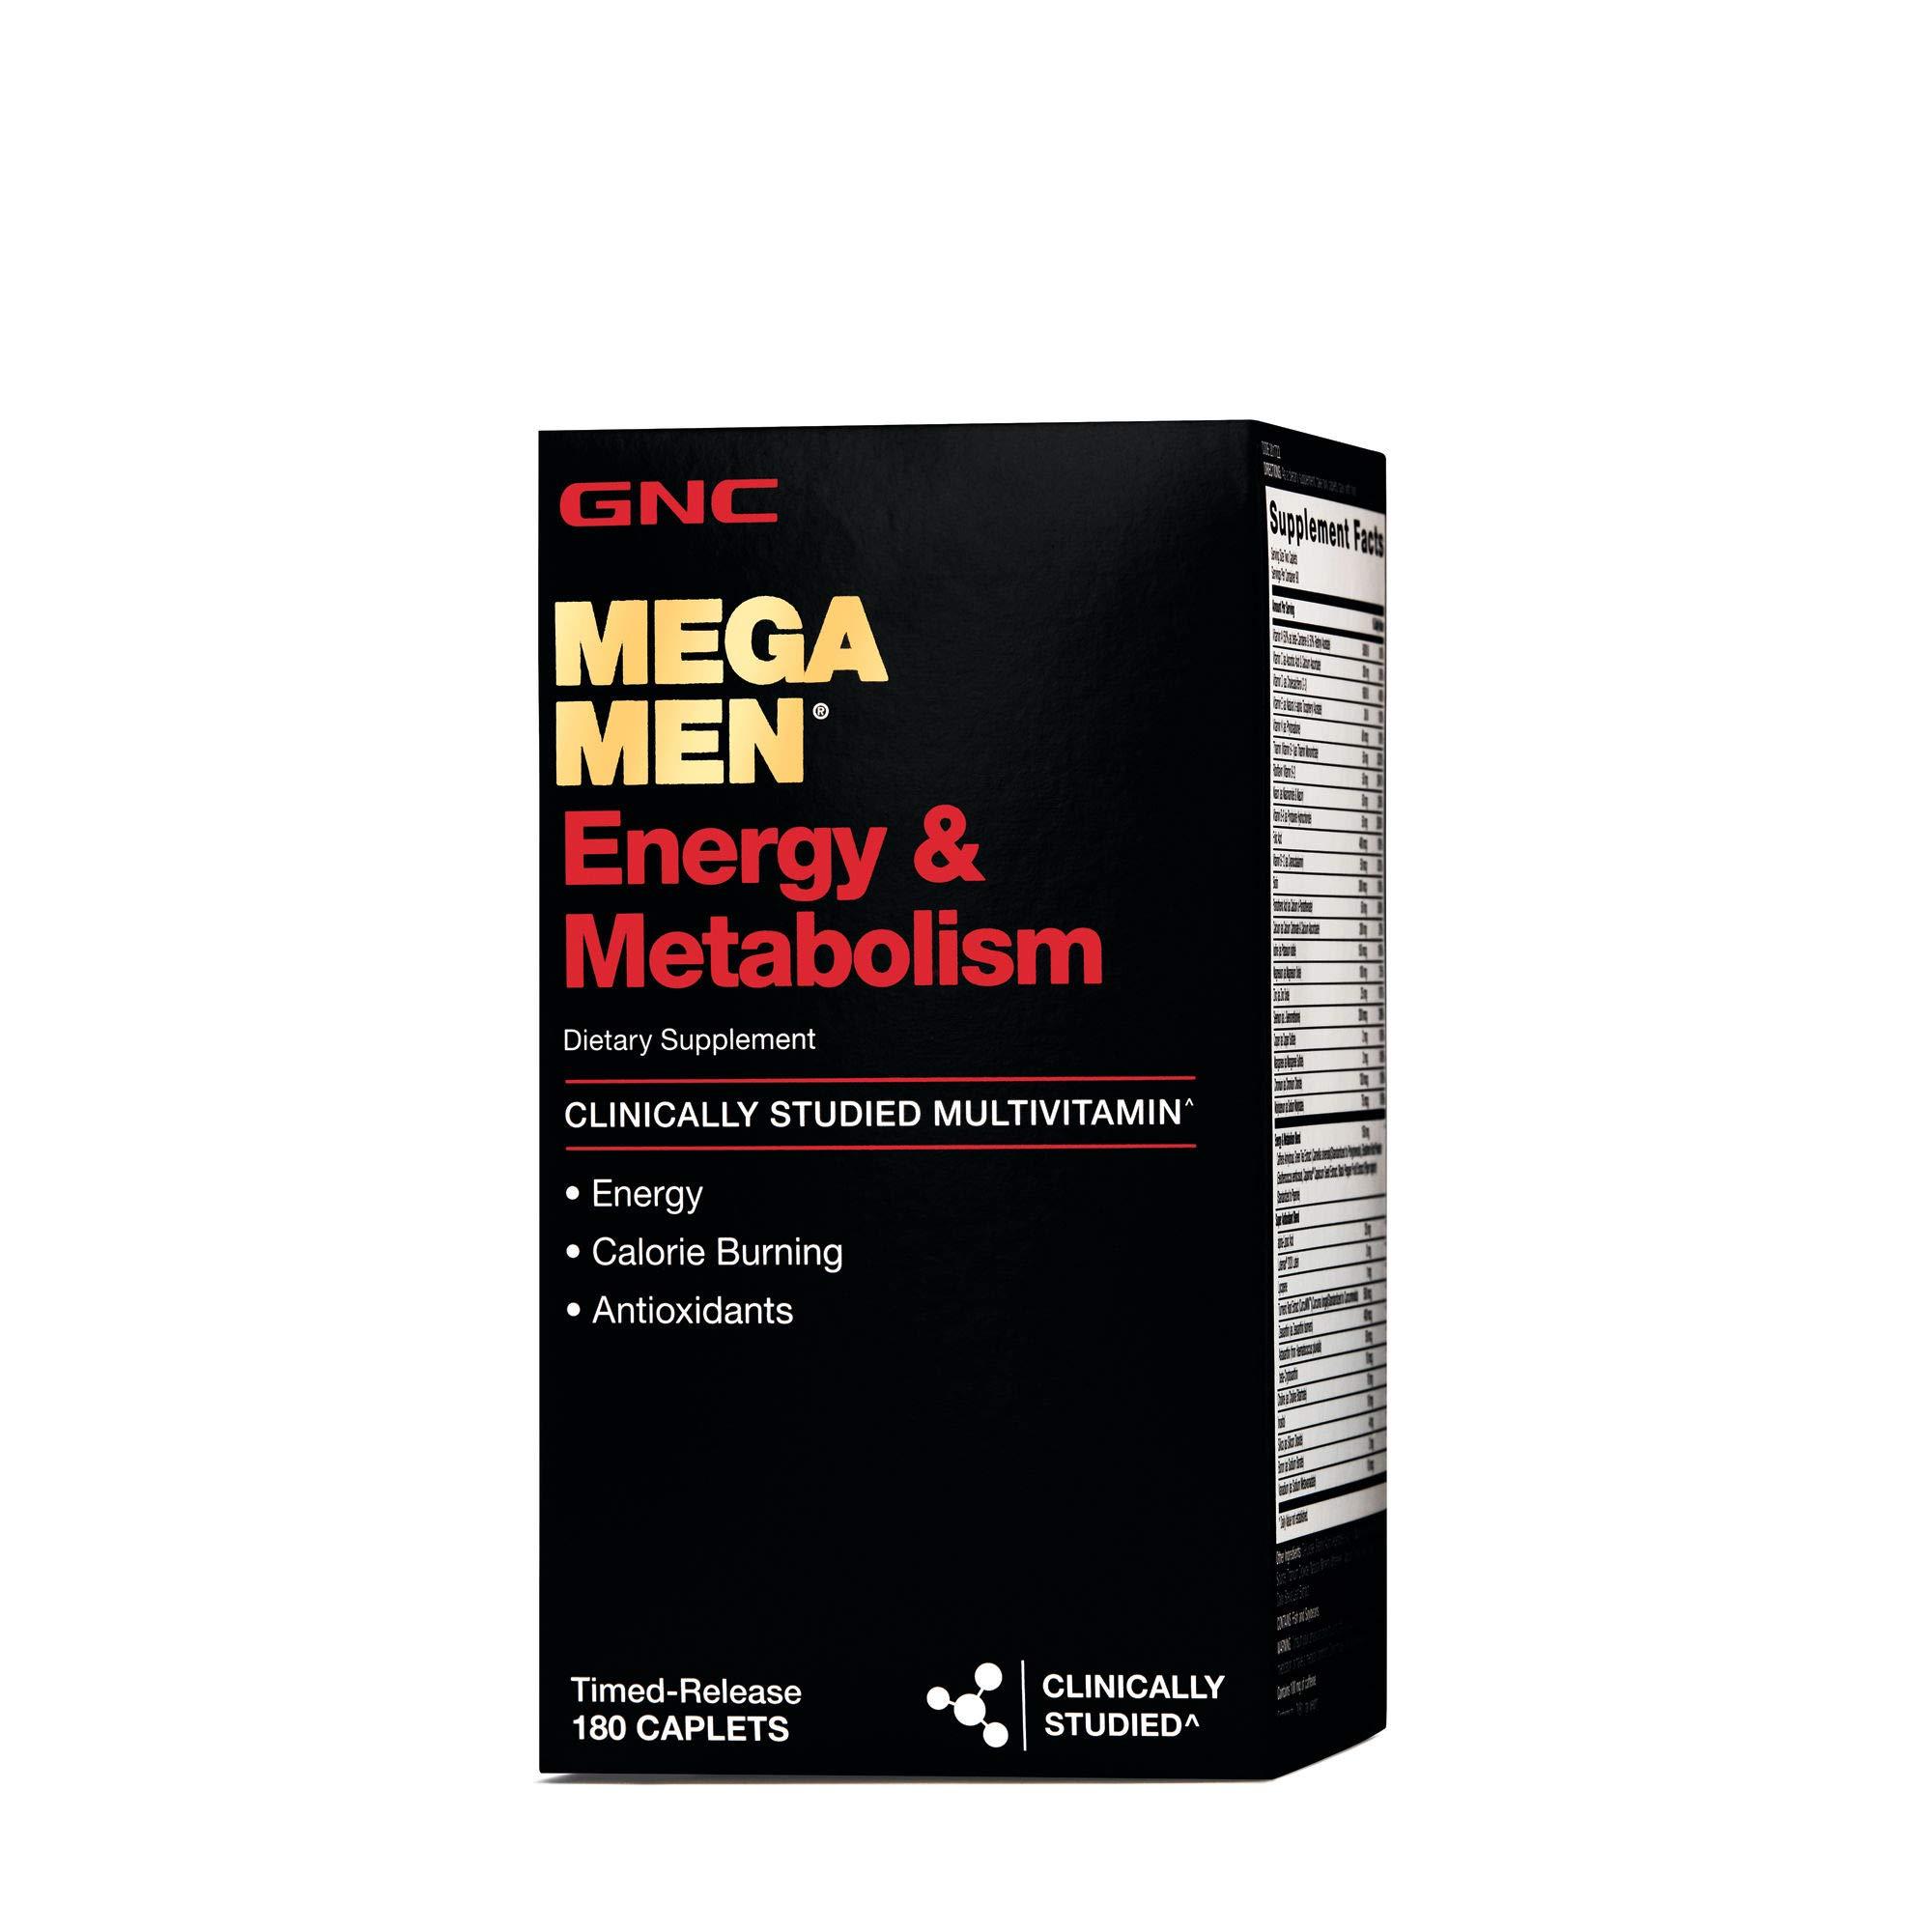 GNC Mega Men Energy Metabolism - 180 Caplets by GNC